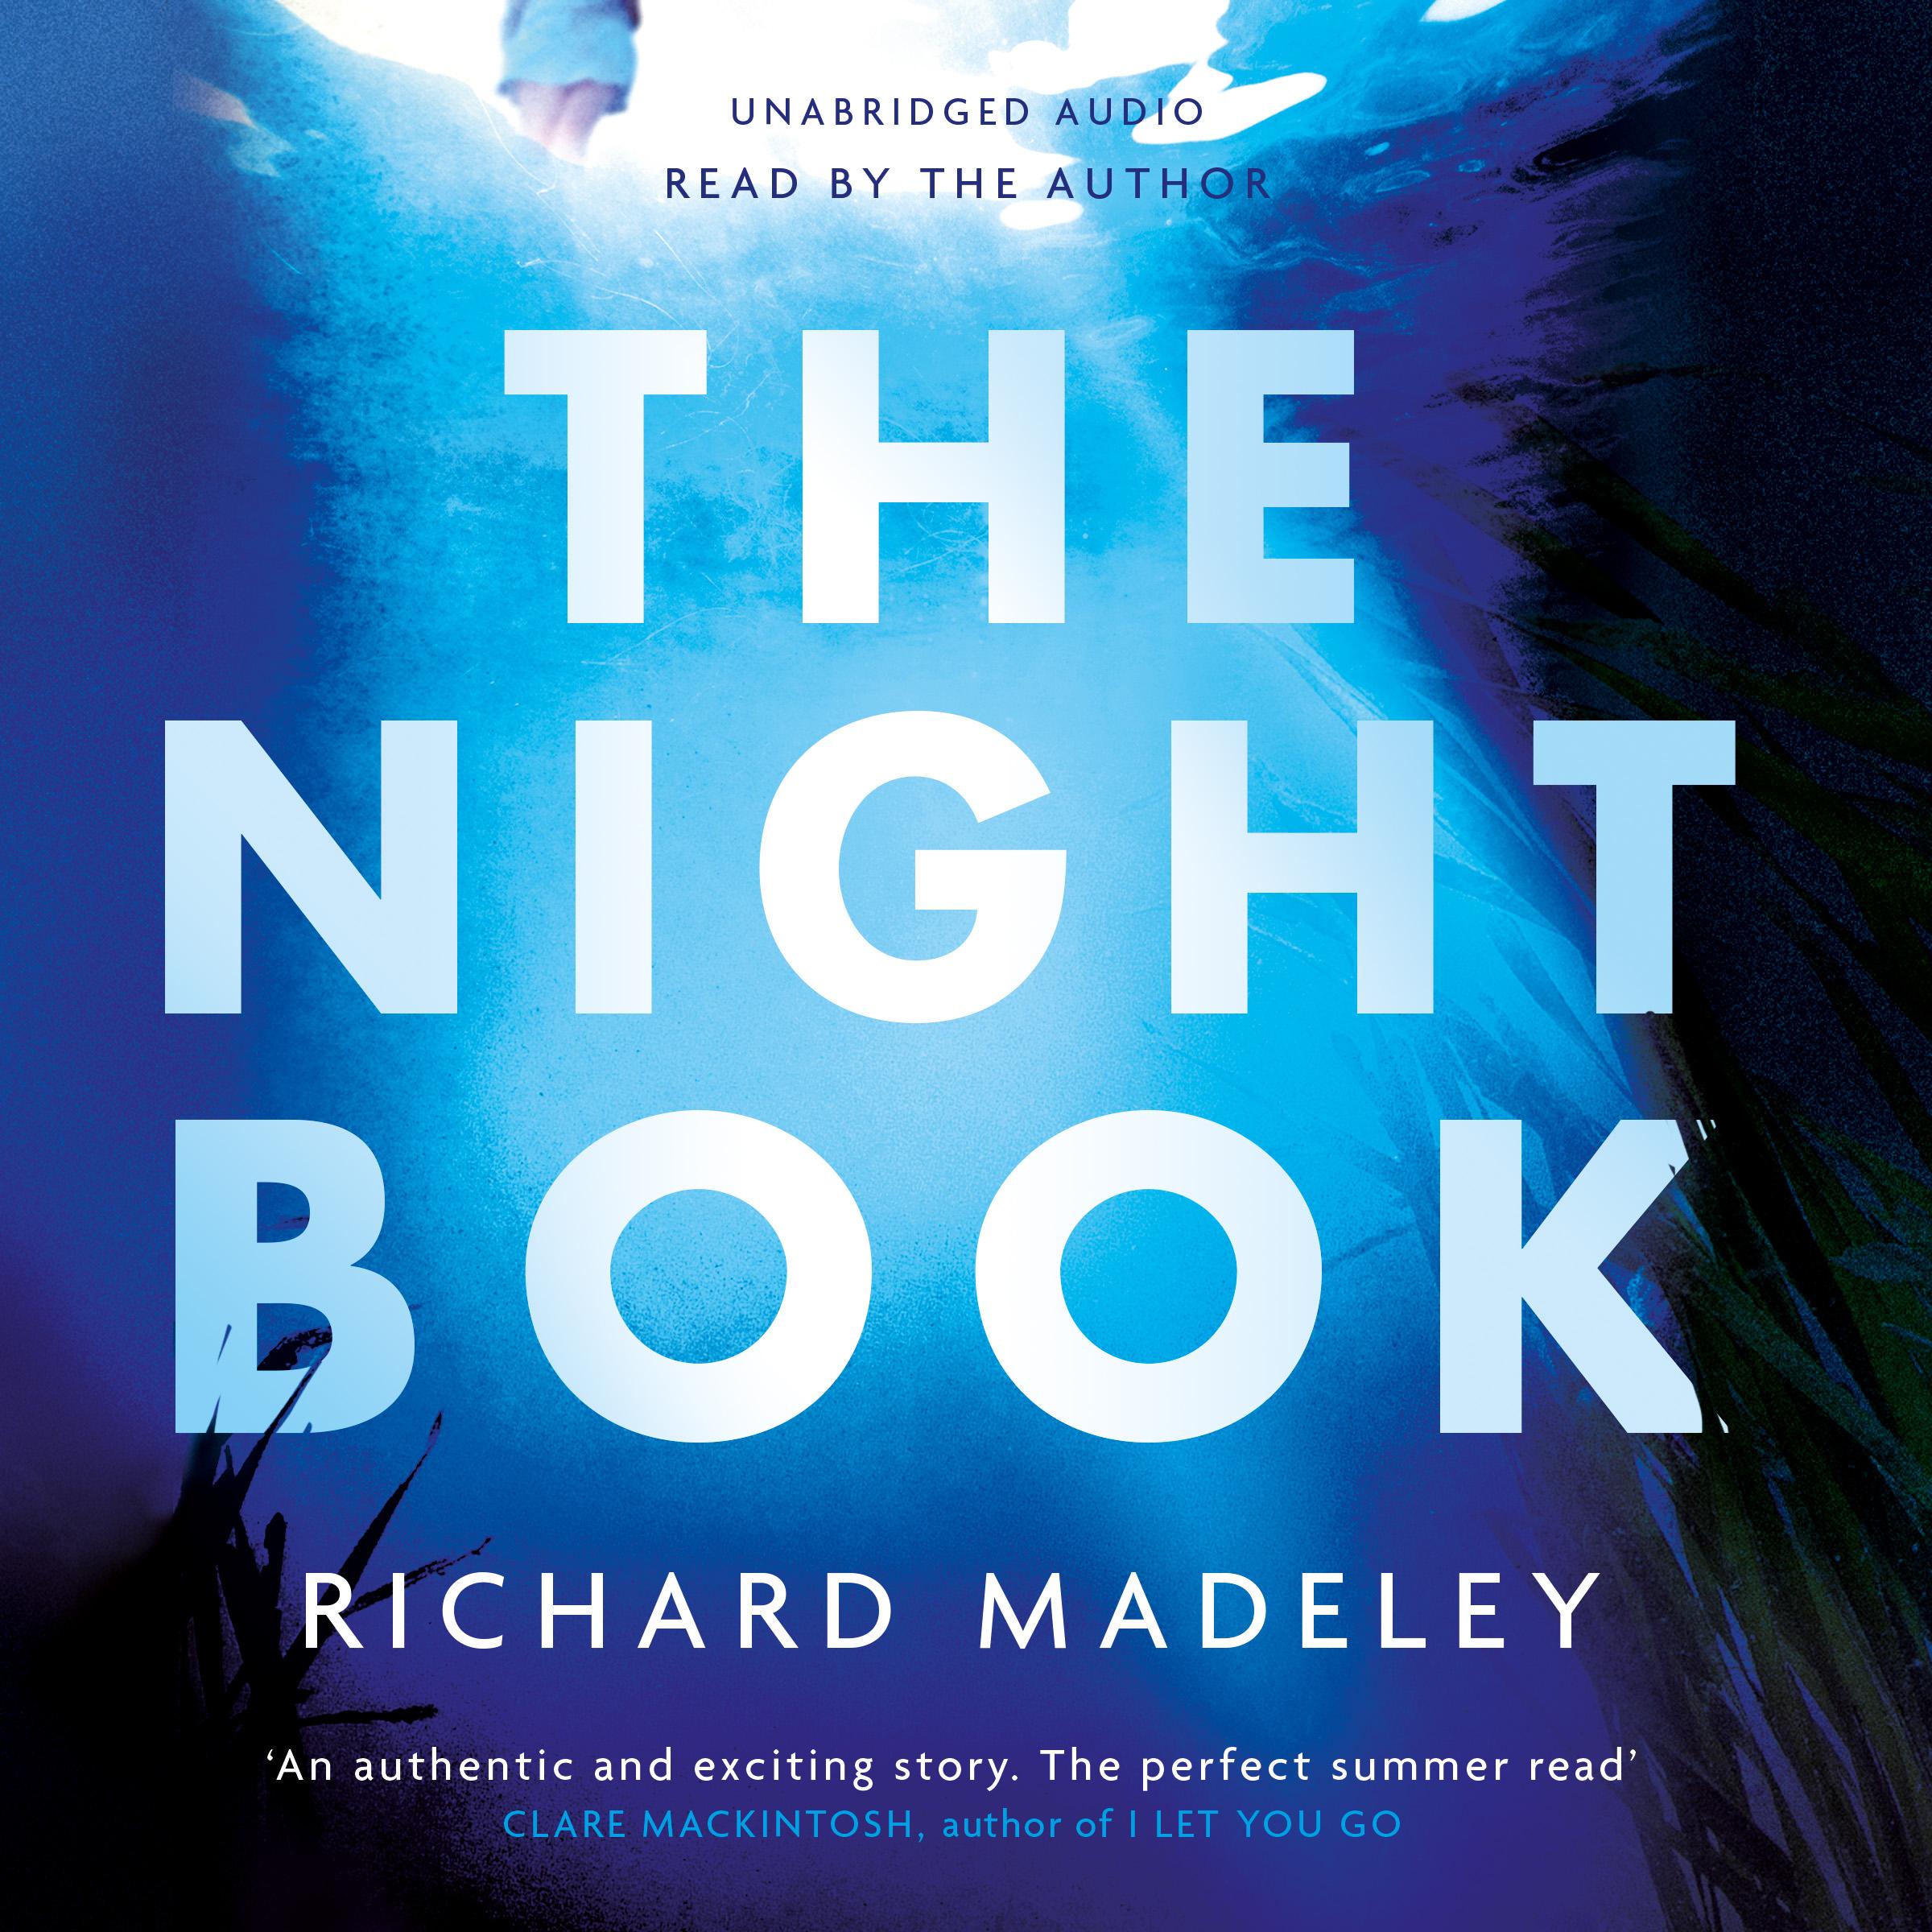 The night book 9781471147357 hr